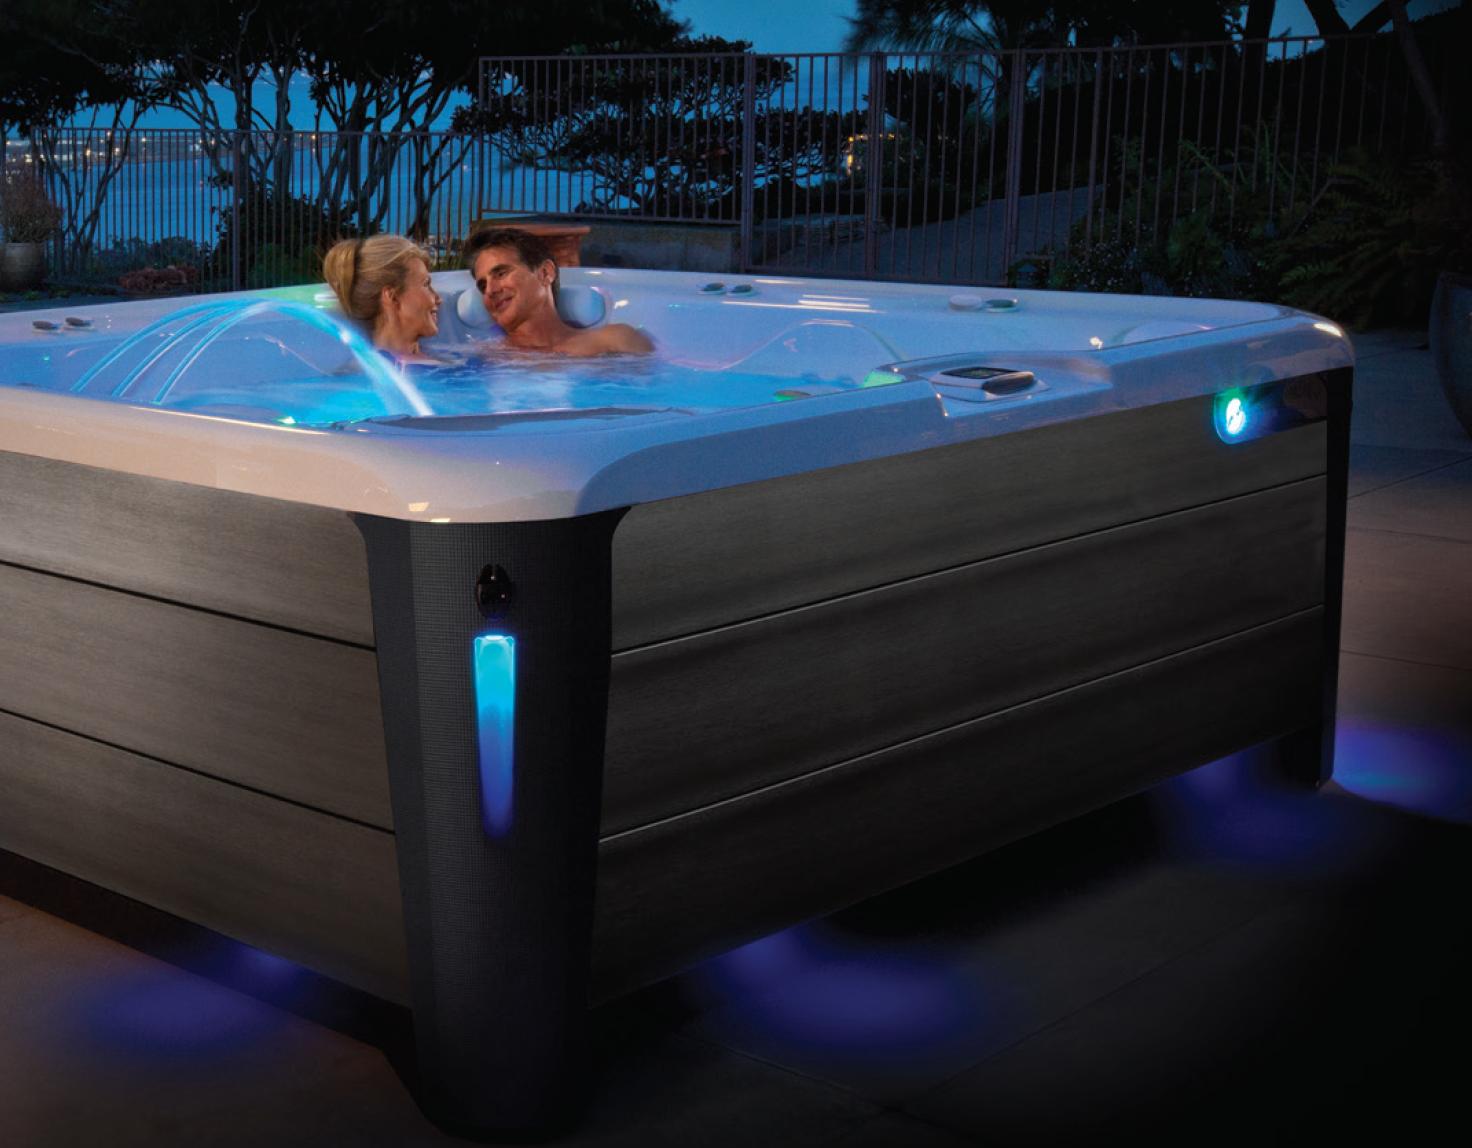 spa-pool-lighting-spashop.co.nz.png